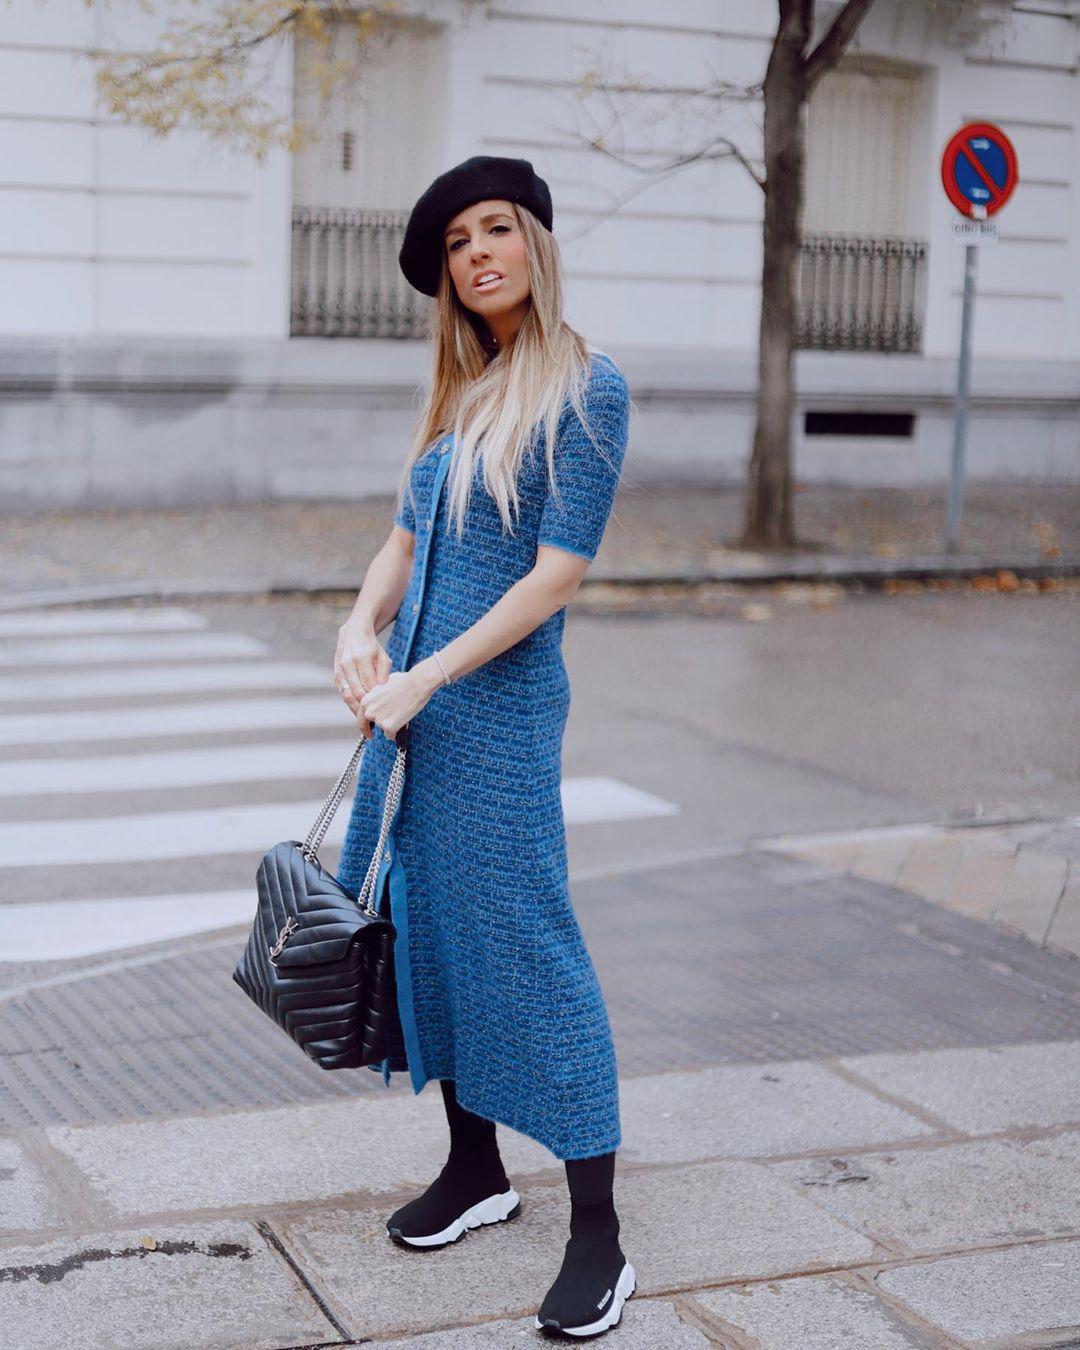 mesh dress with metallic thread de Zara sur lulandco